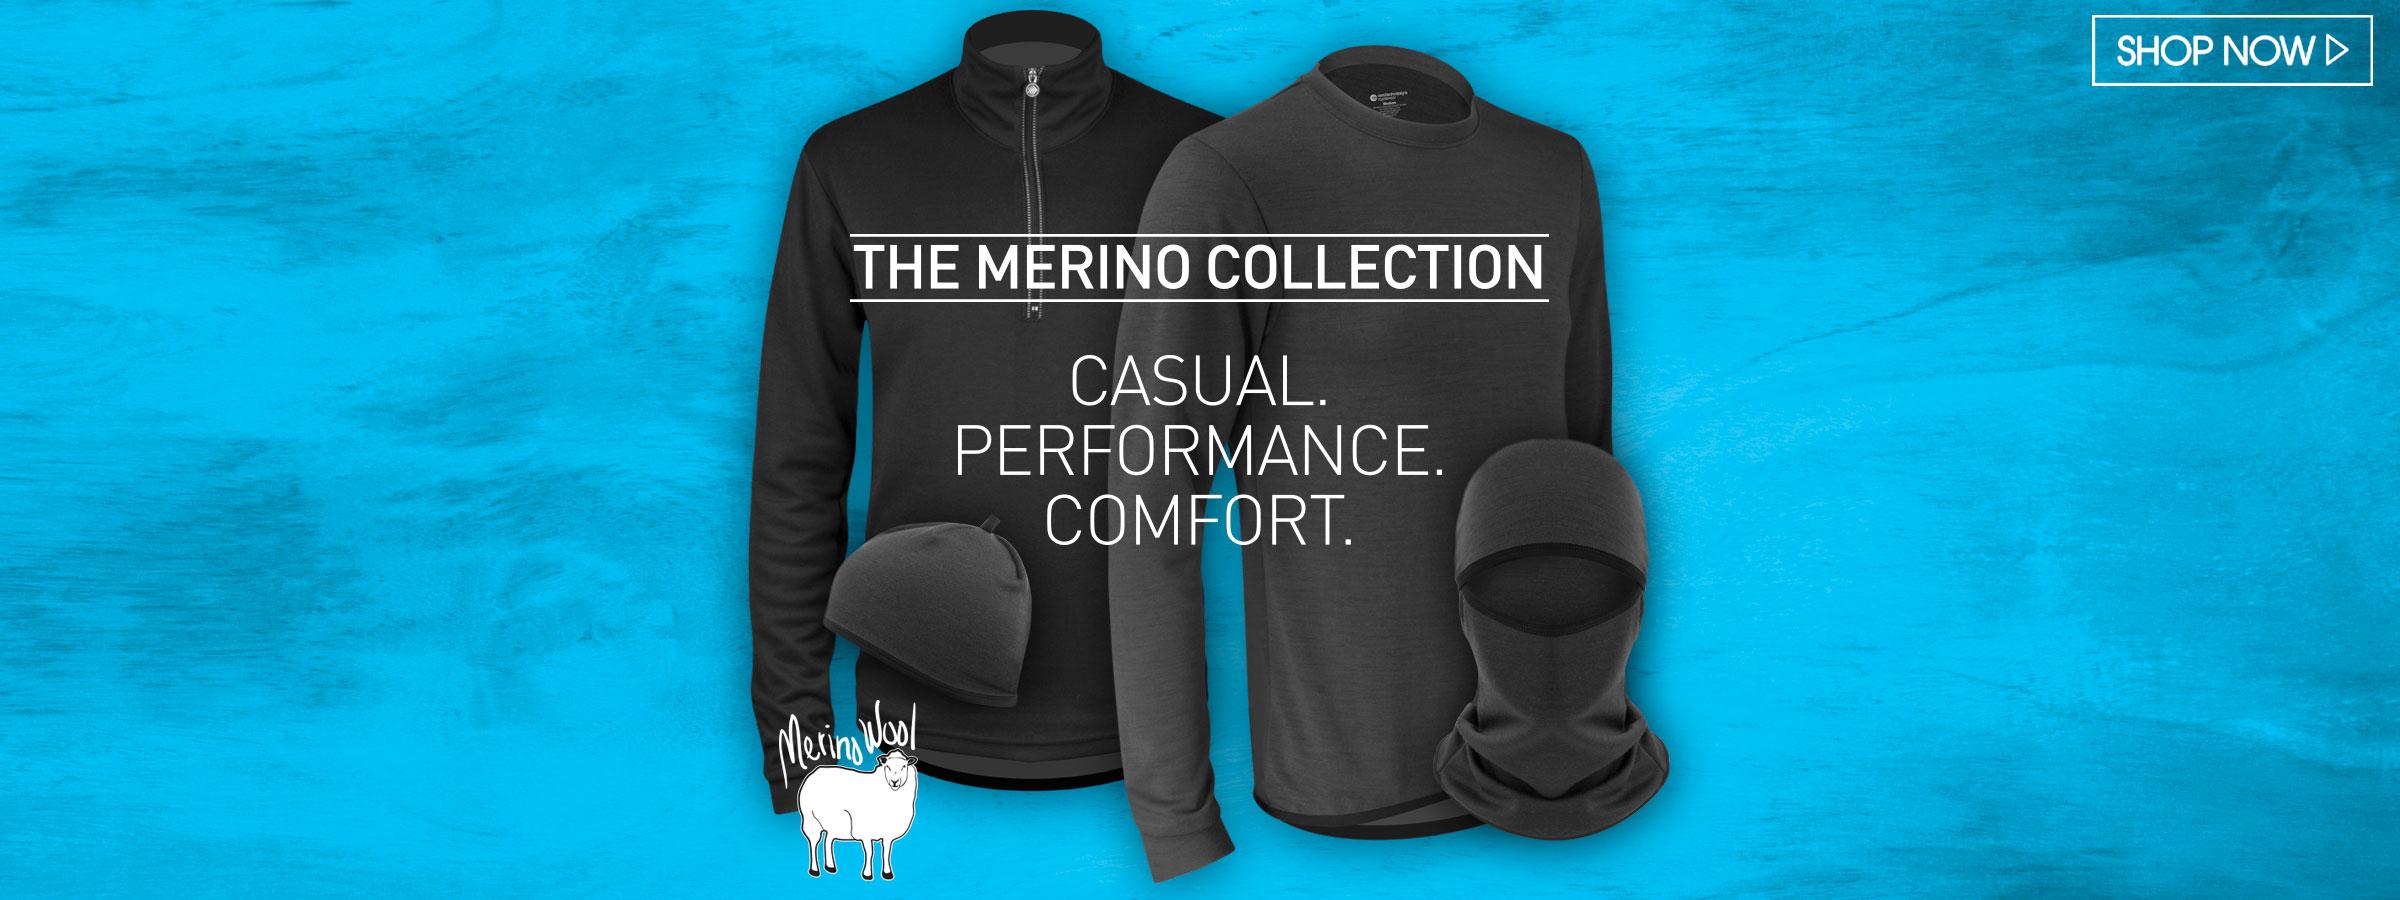 merino wool cycling apparel